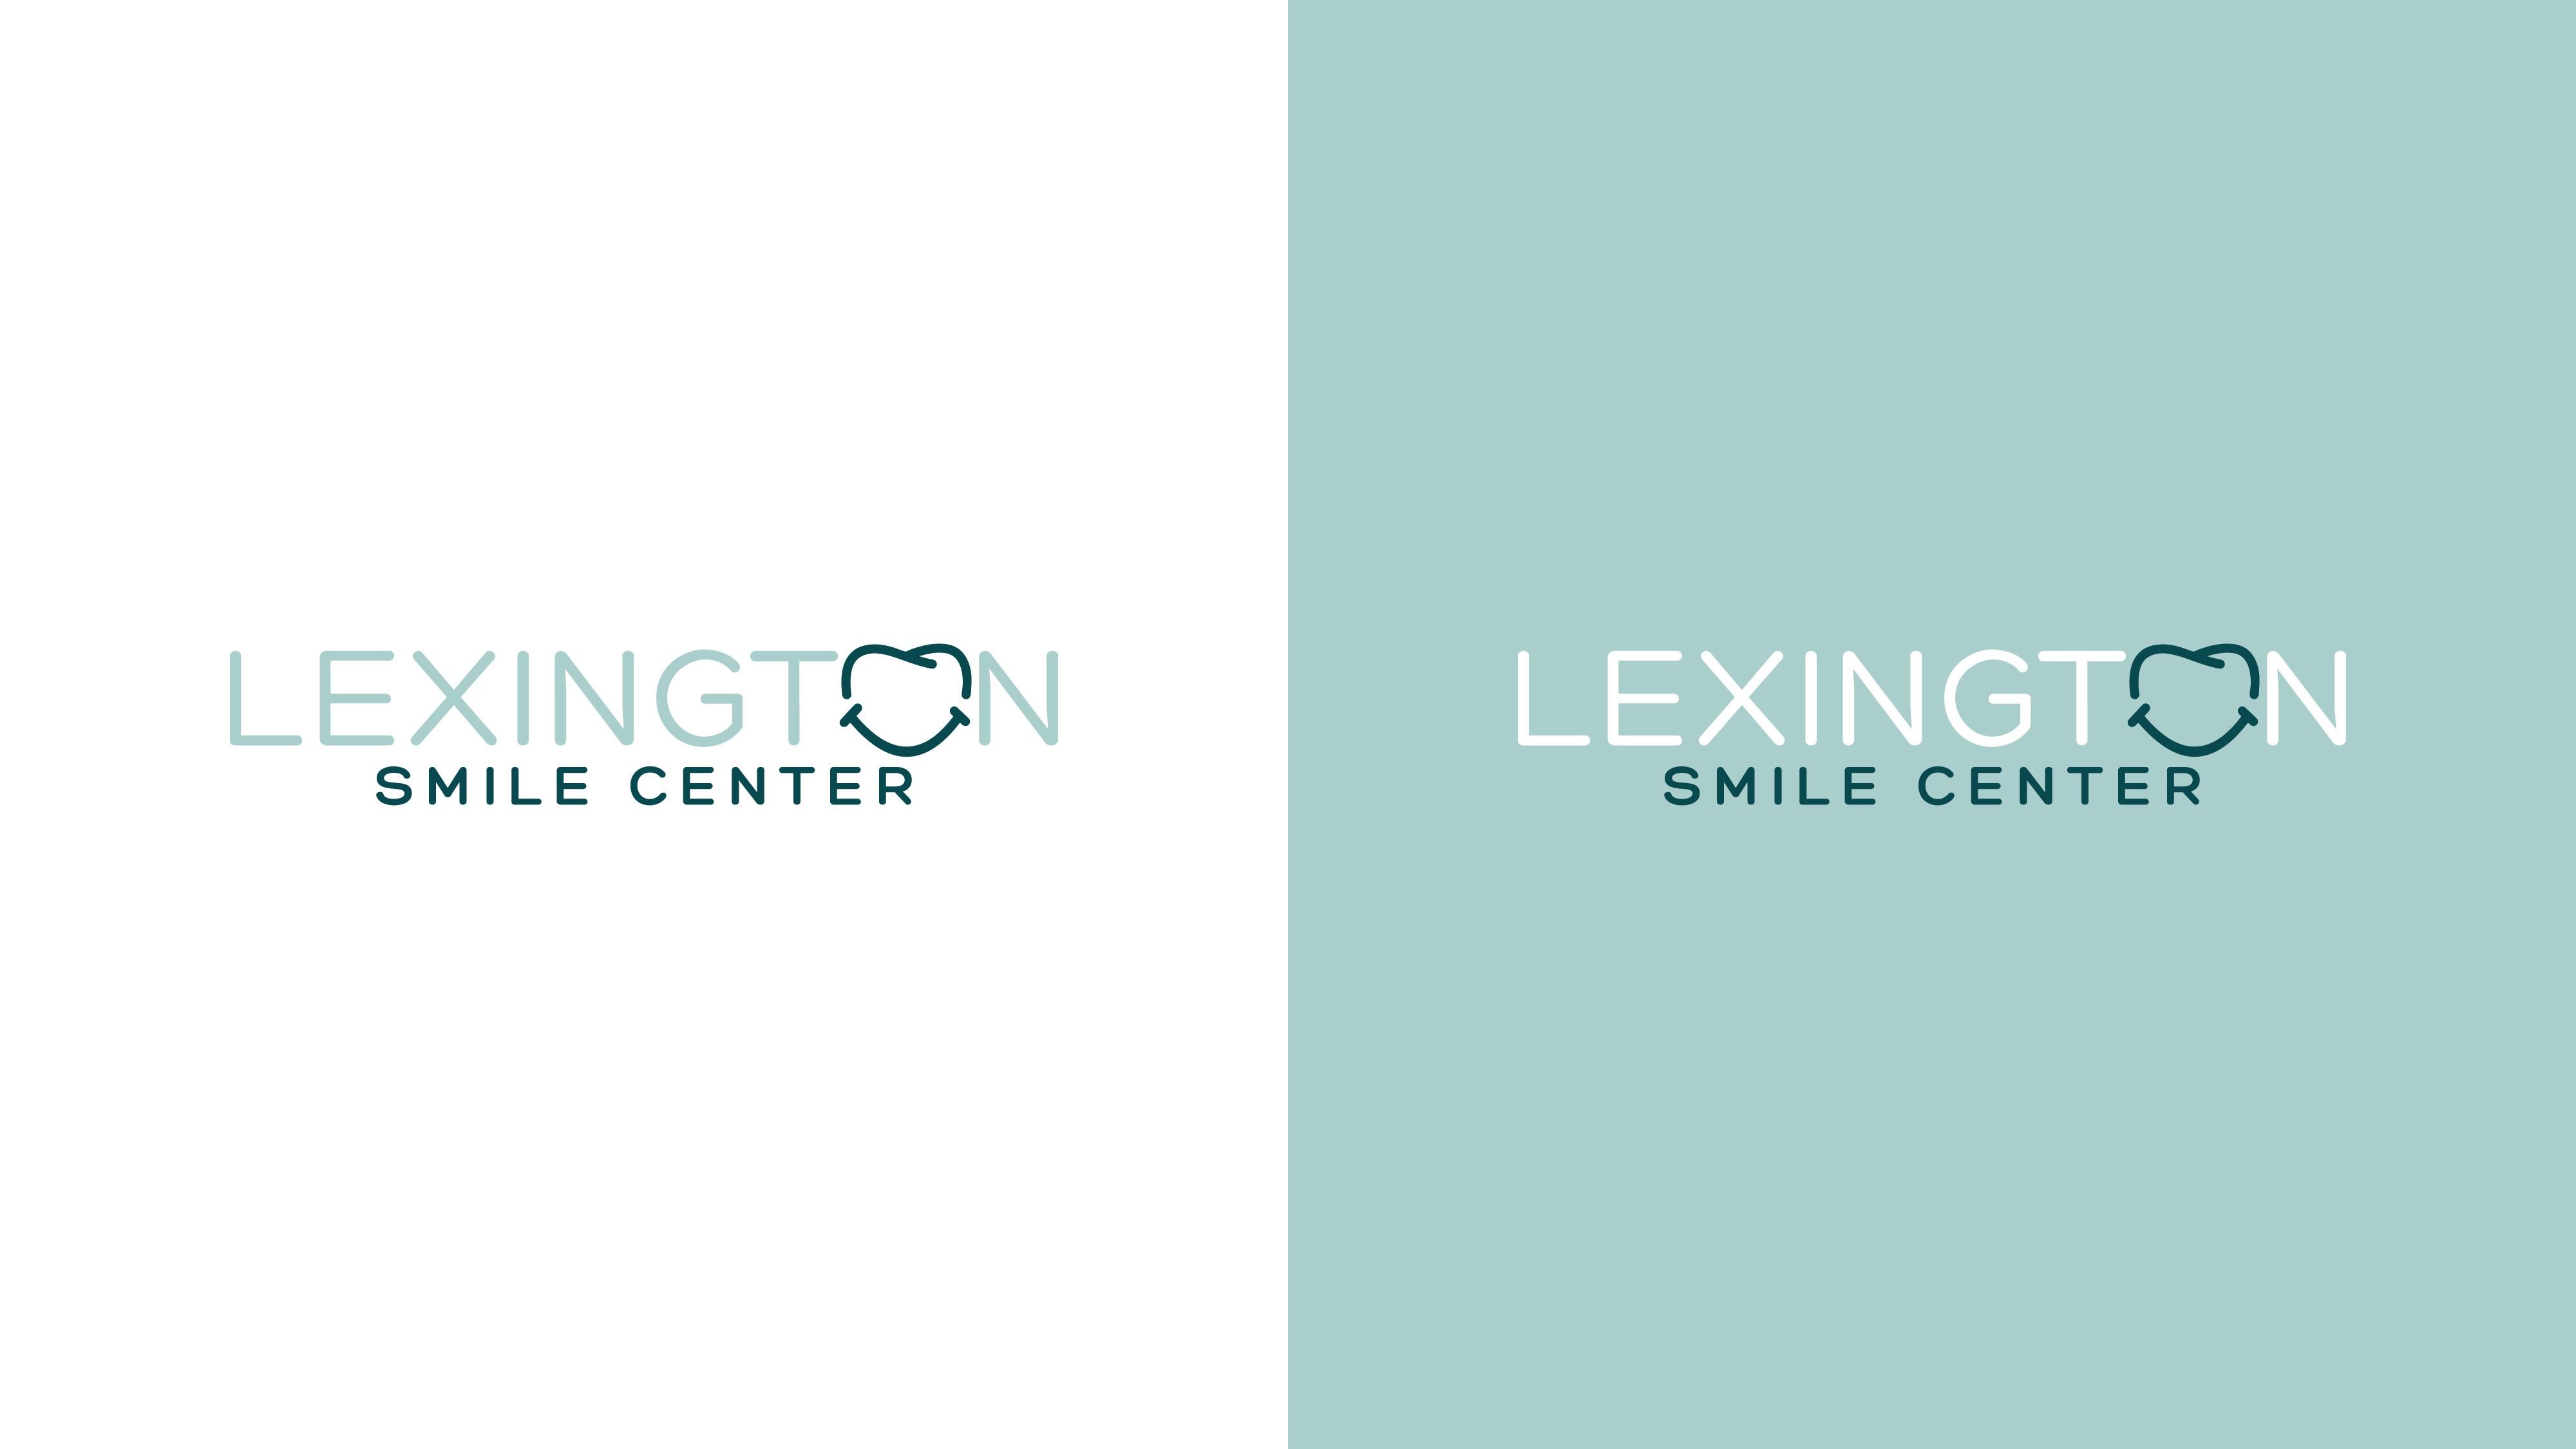 Lexington Smile Center